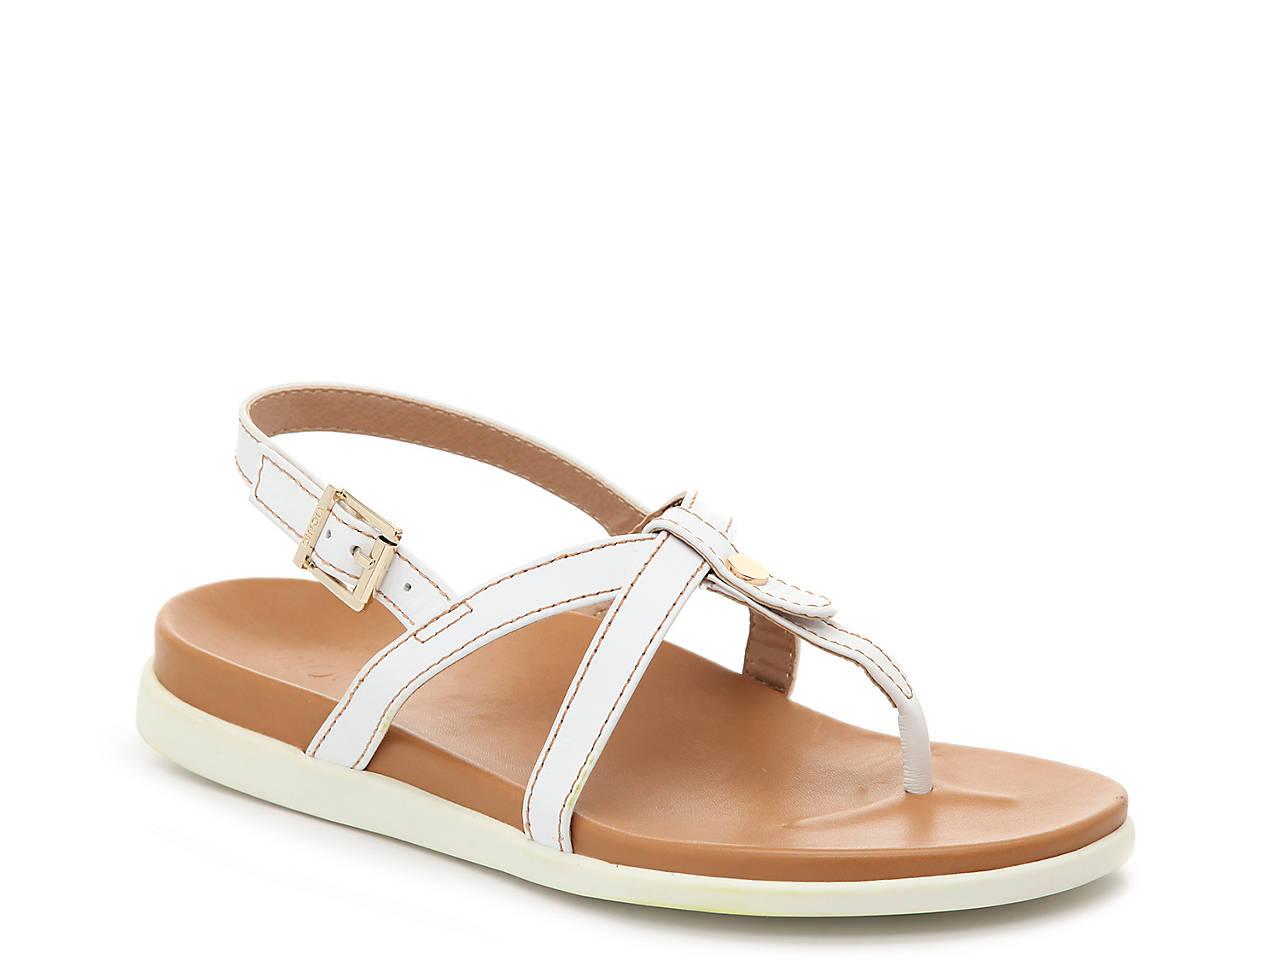 cded17b3479e Vionic Veranda Sandal Women s Shoes